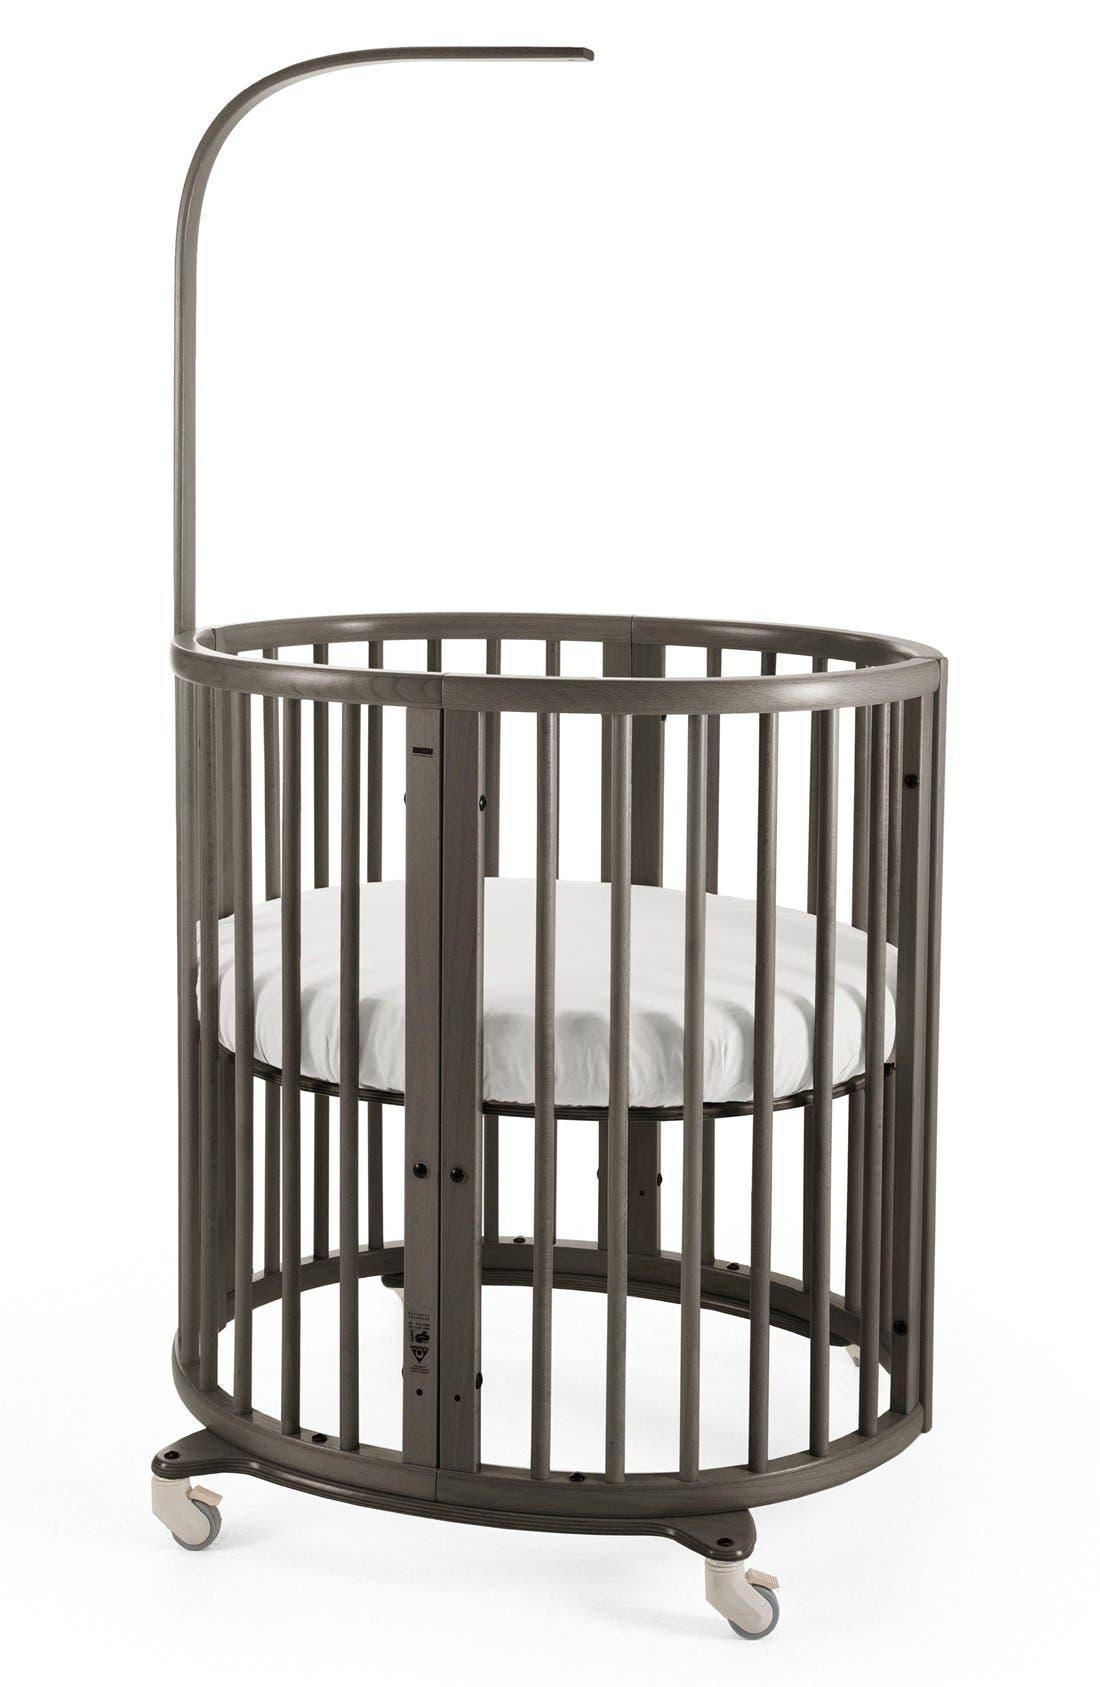 STOKKE Sleepi Mini Crib, Drape Rod & Mattress Bundle, Main, color, 030